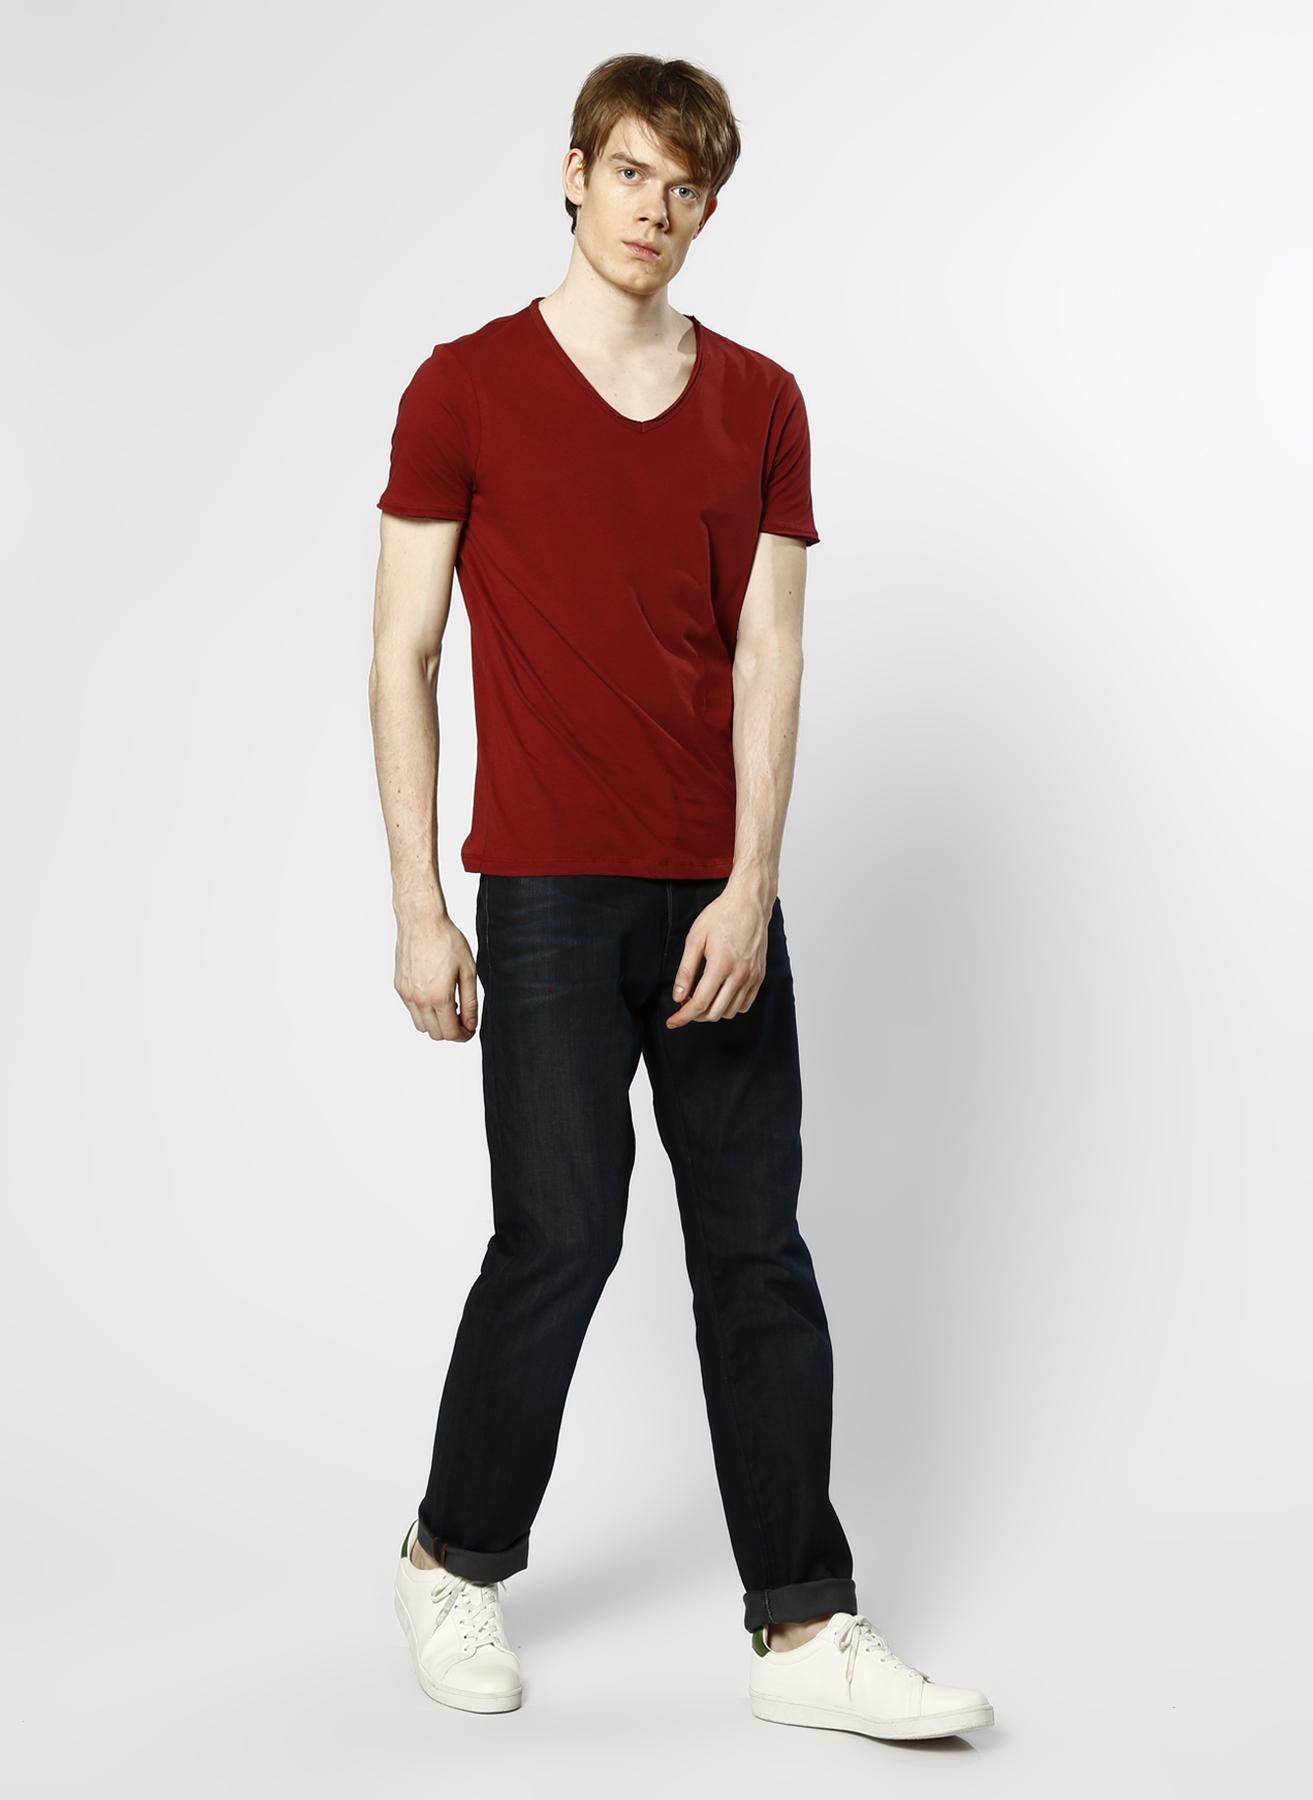 Loft Carlos Straight Lacivert Klasik Pantolon 40-32 5000202217017 Ürün Resmi